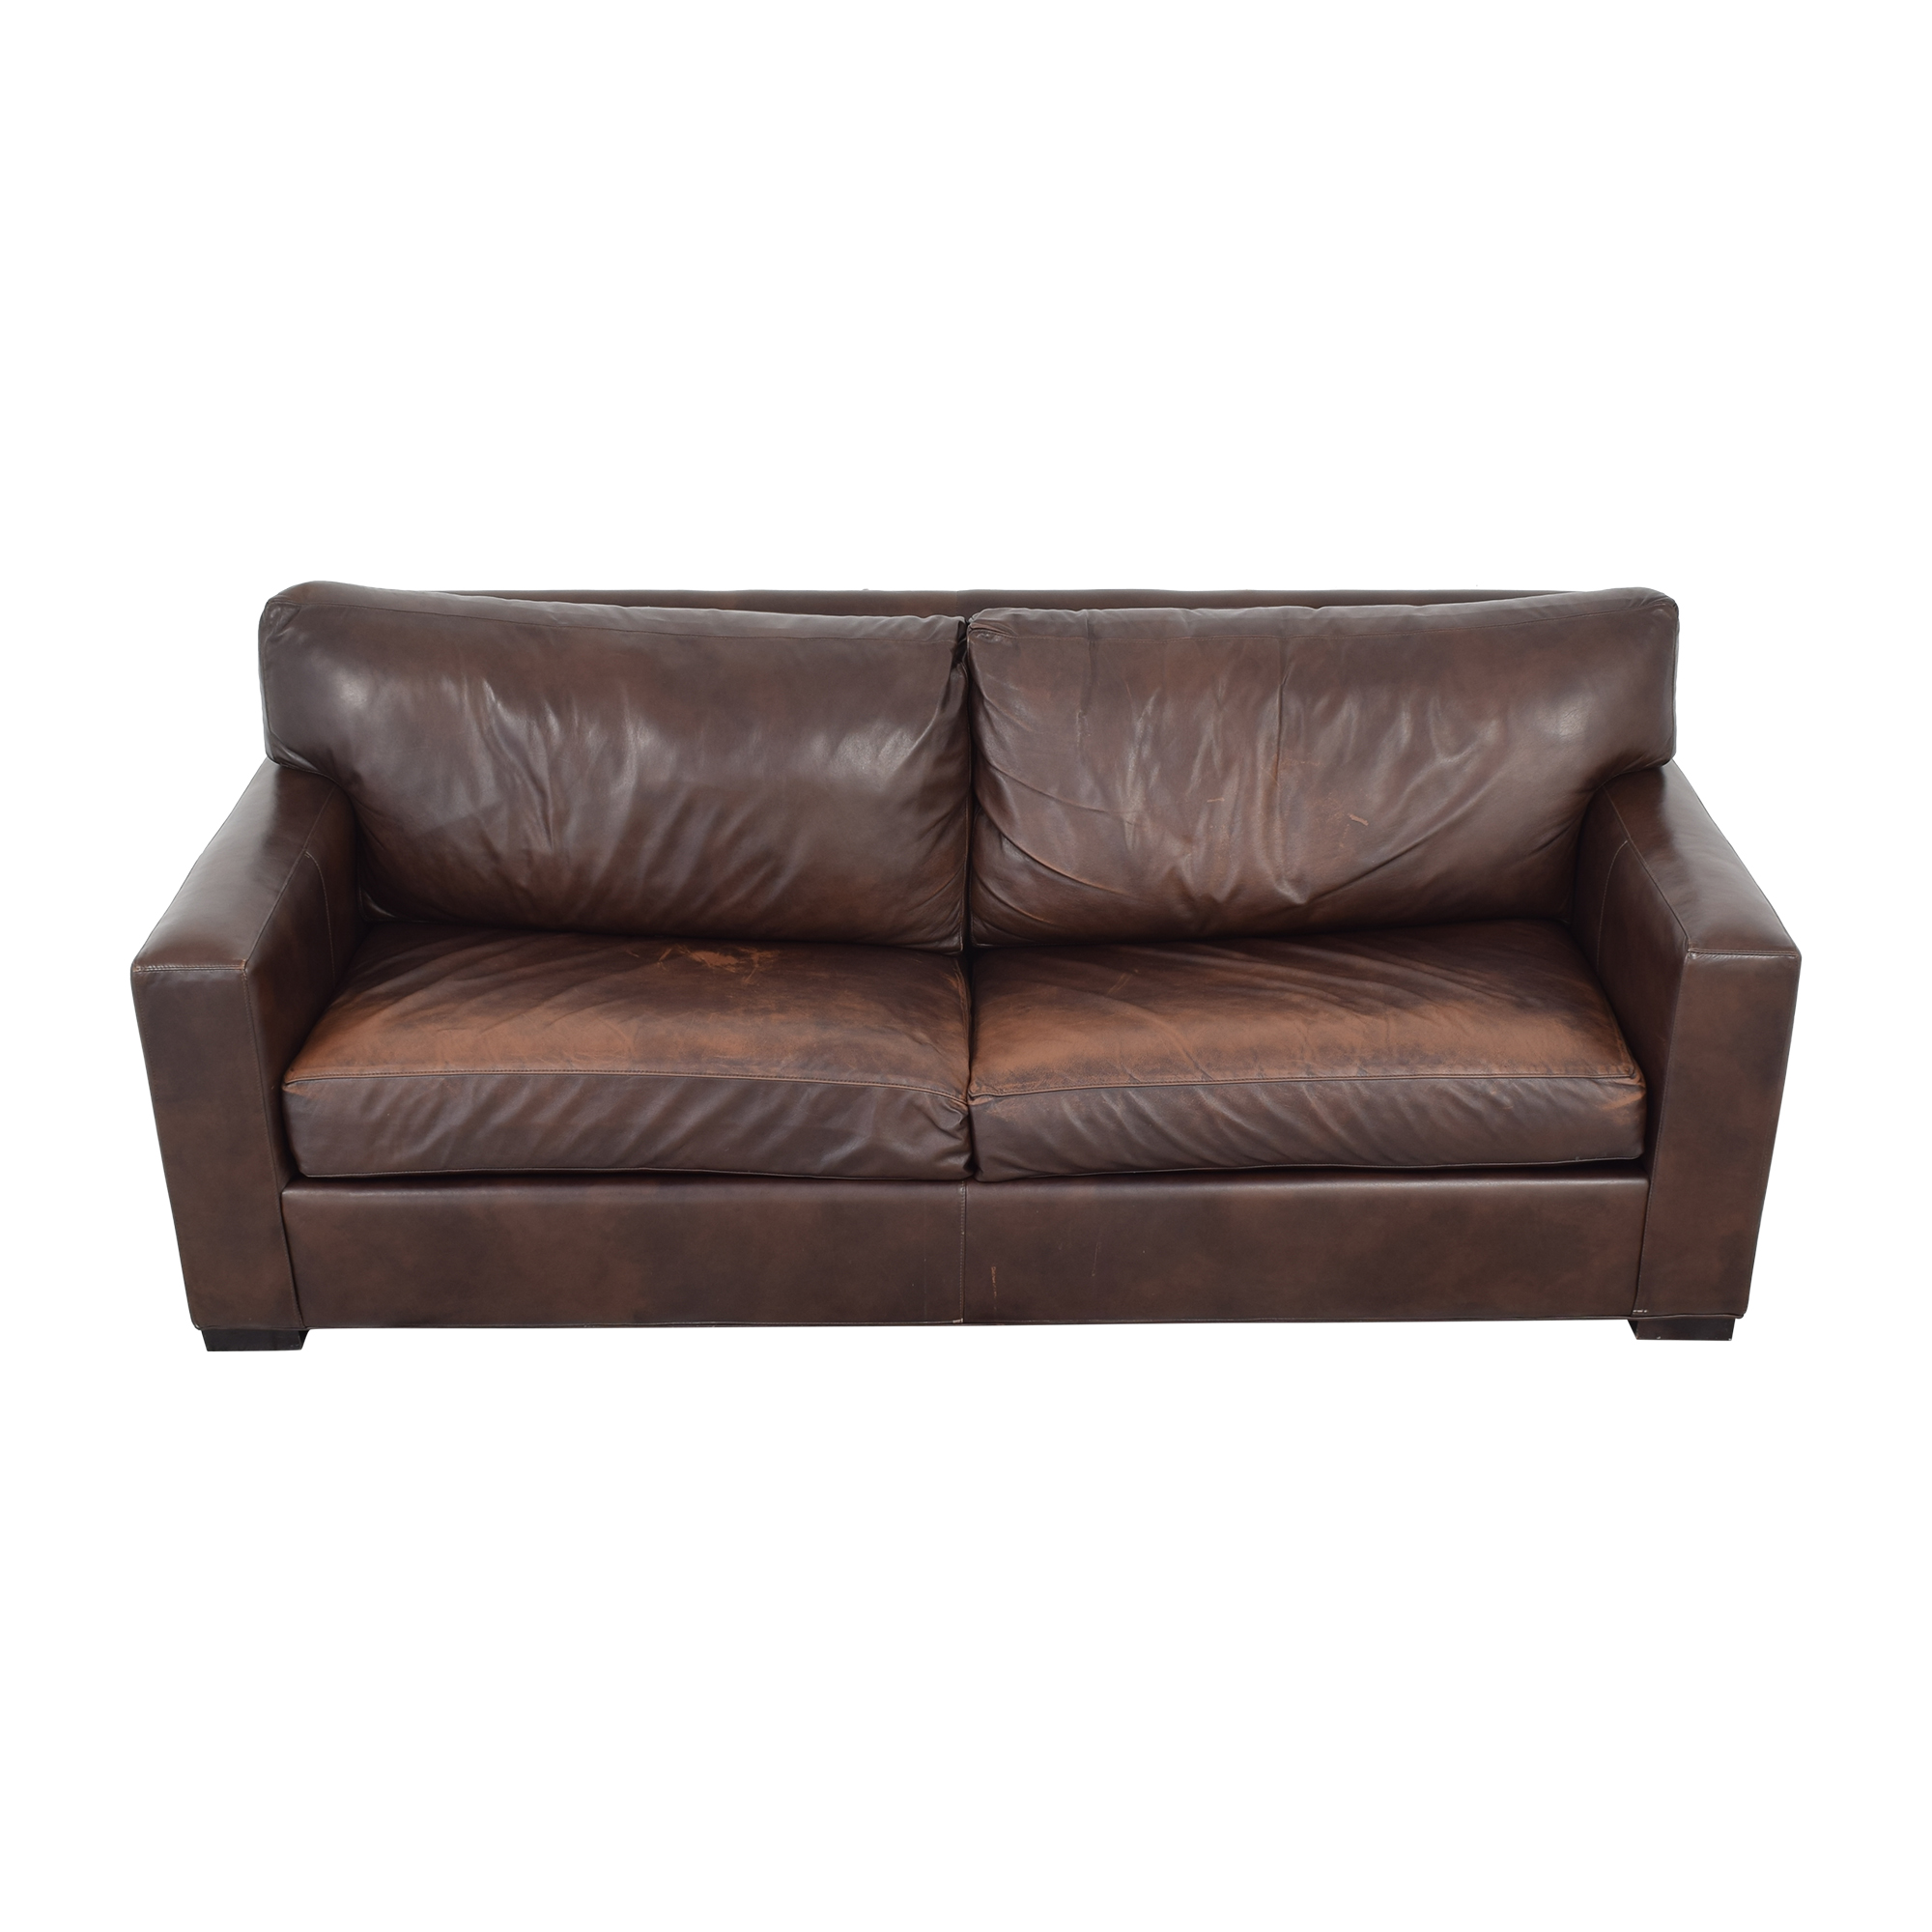 Crate & Barrel Crate & Barrel Axis II Leather Two Seat Queen Sleeper Sofa discount